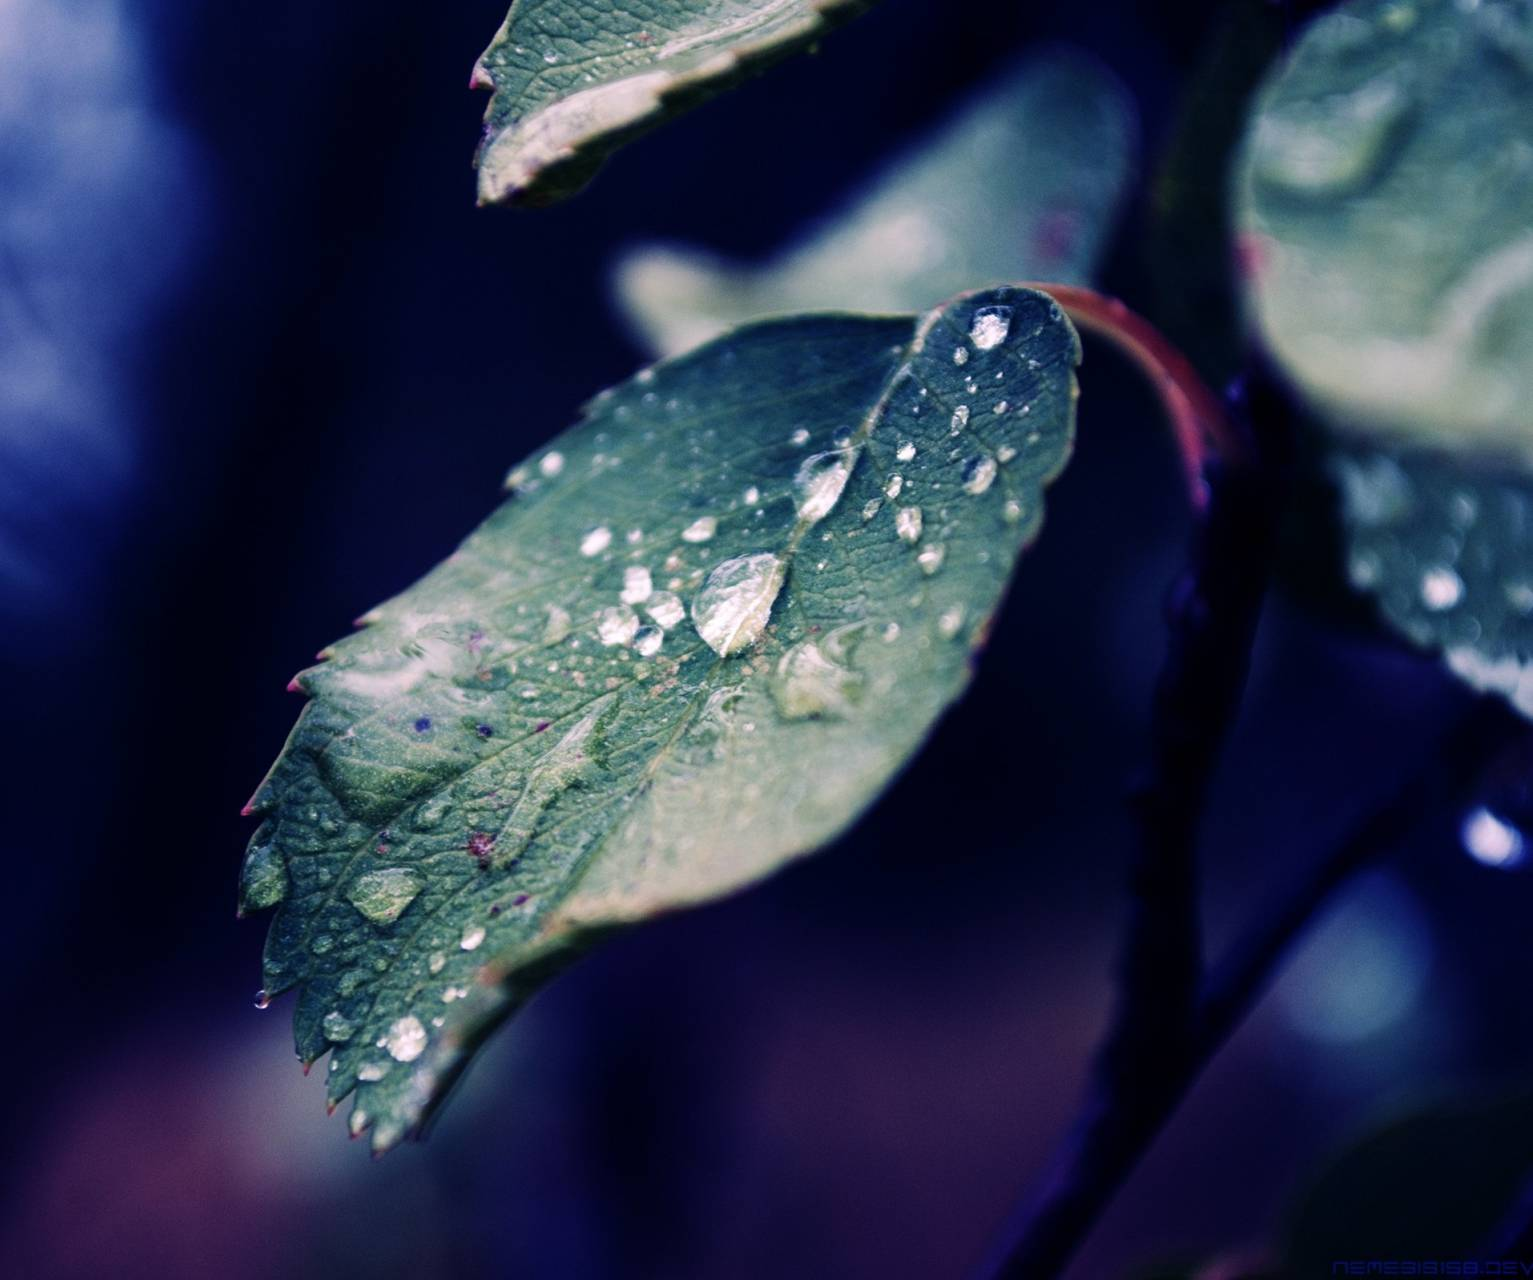 Fall rain of nature